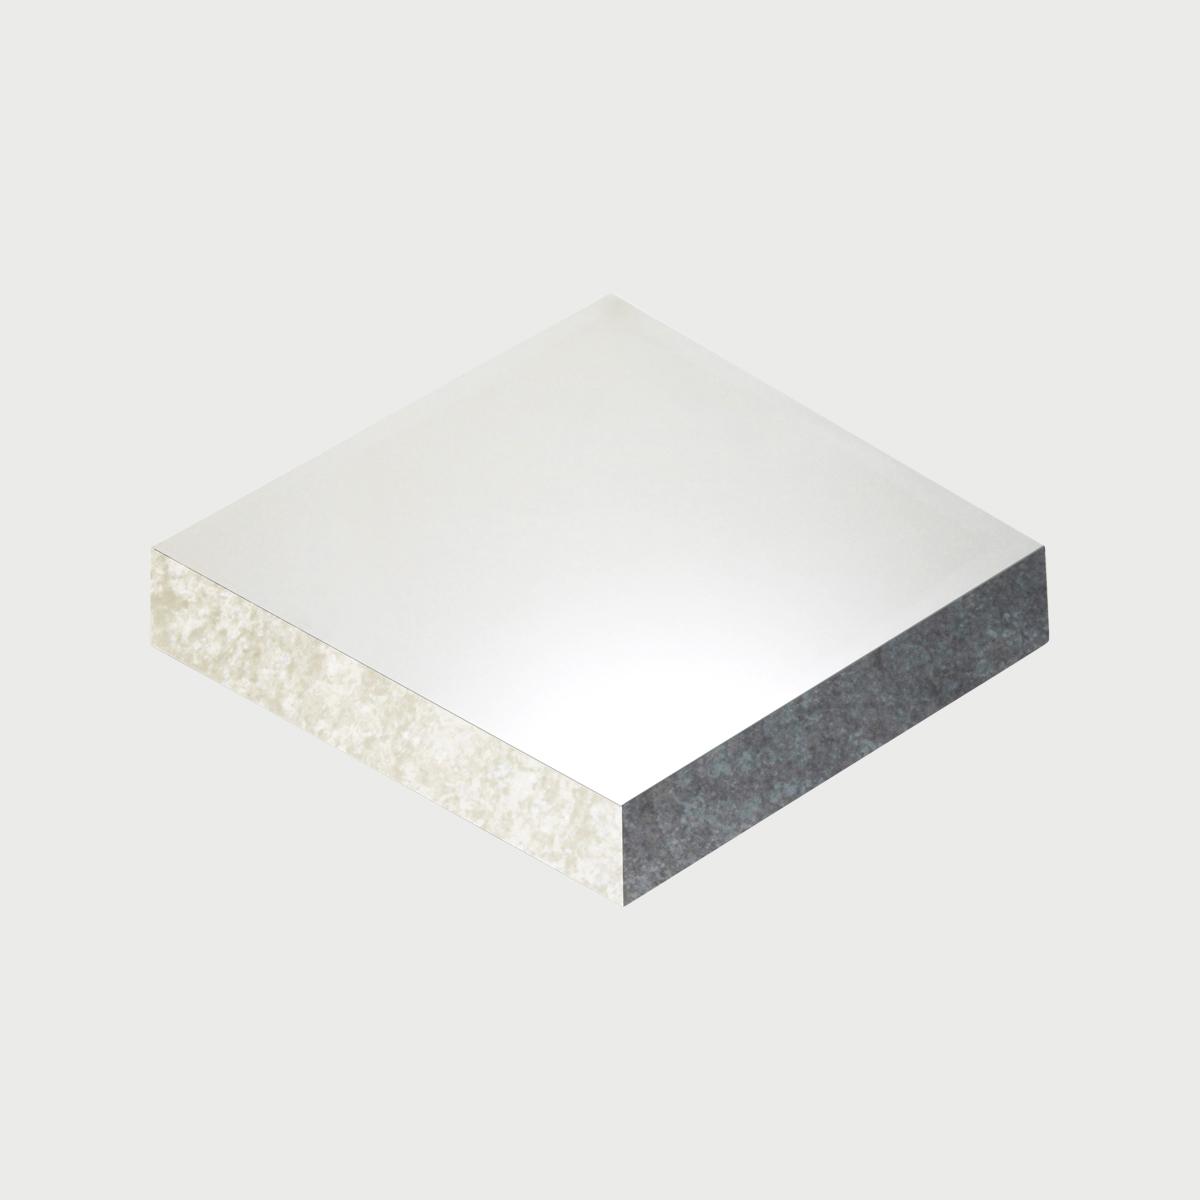 Isogrid mirror 01 grey